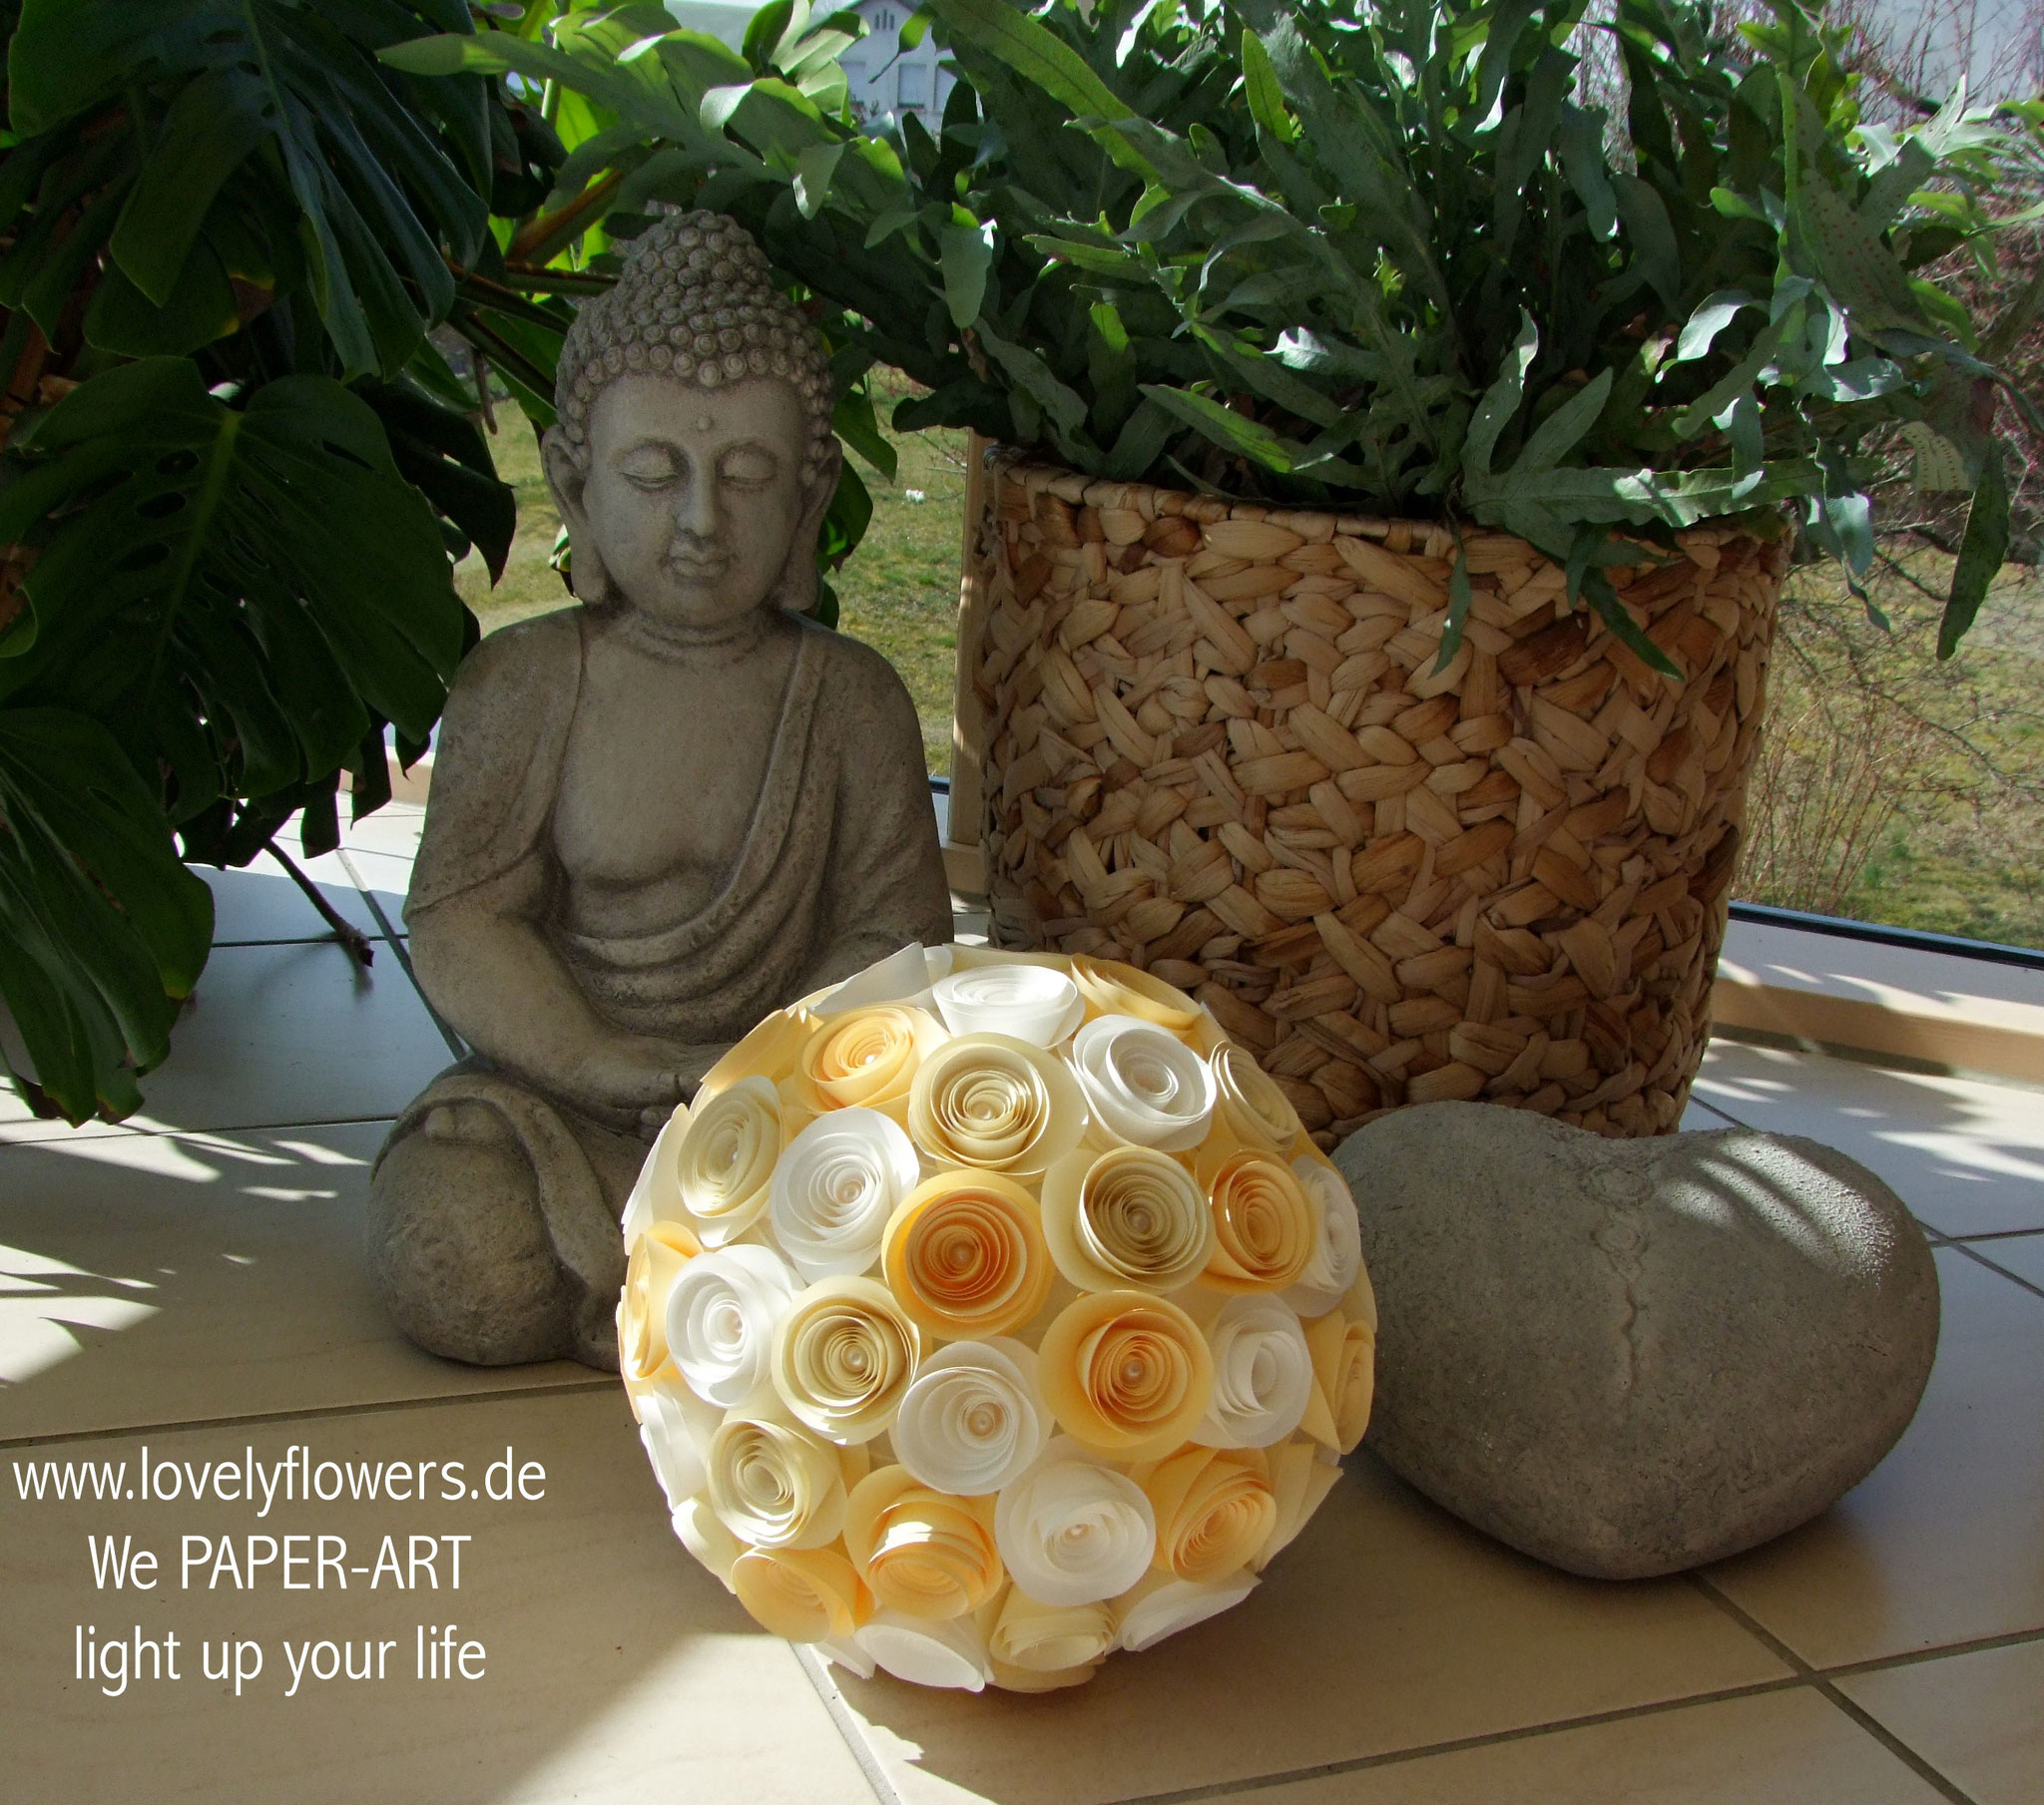 www.lovelyflowers.de - Paper Art Lampen verschönern Deinen Wintergarten!